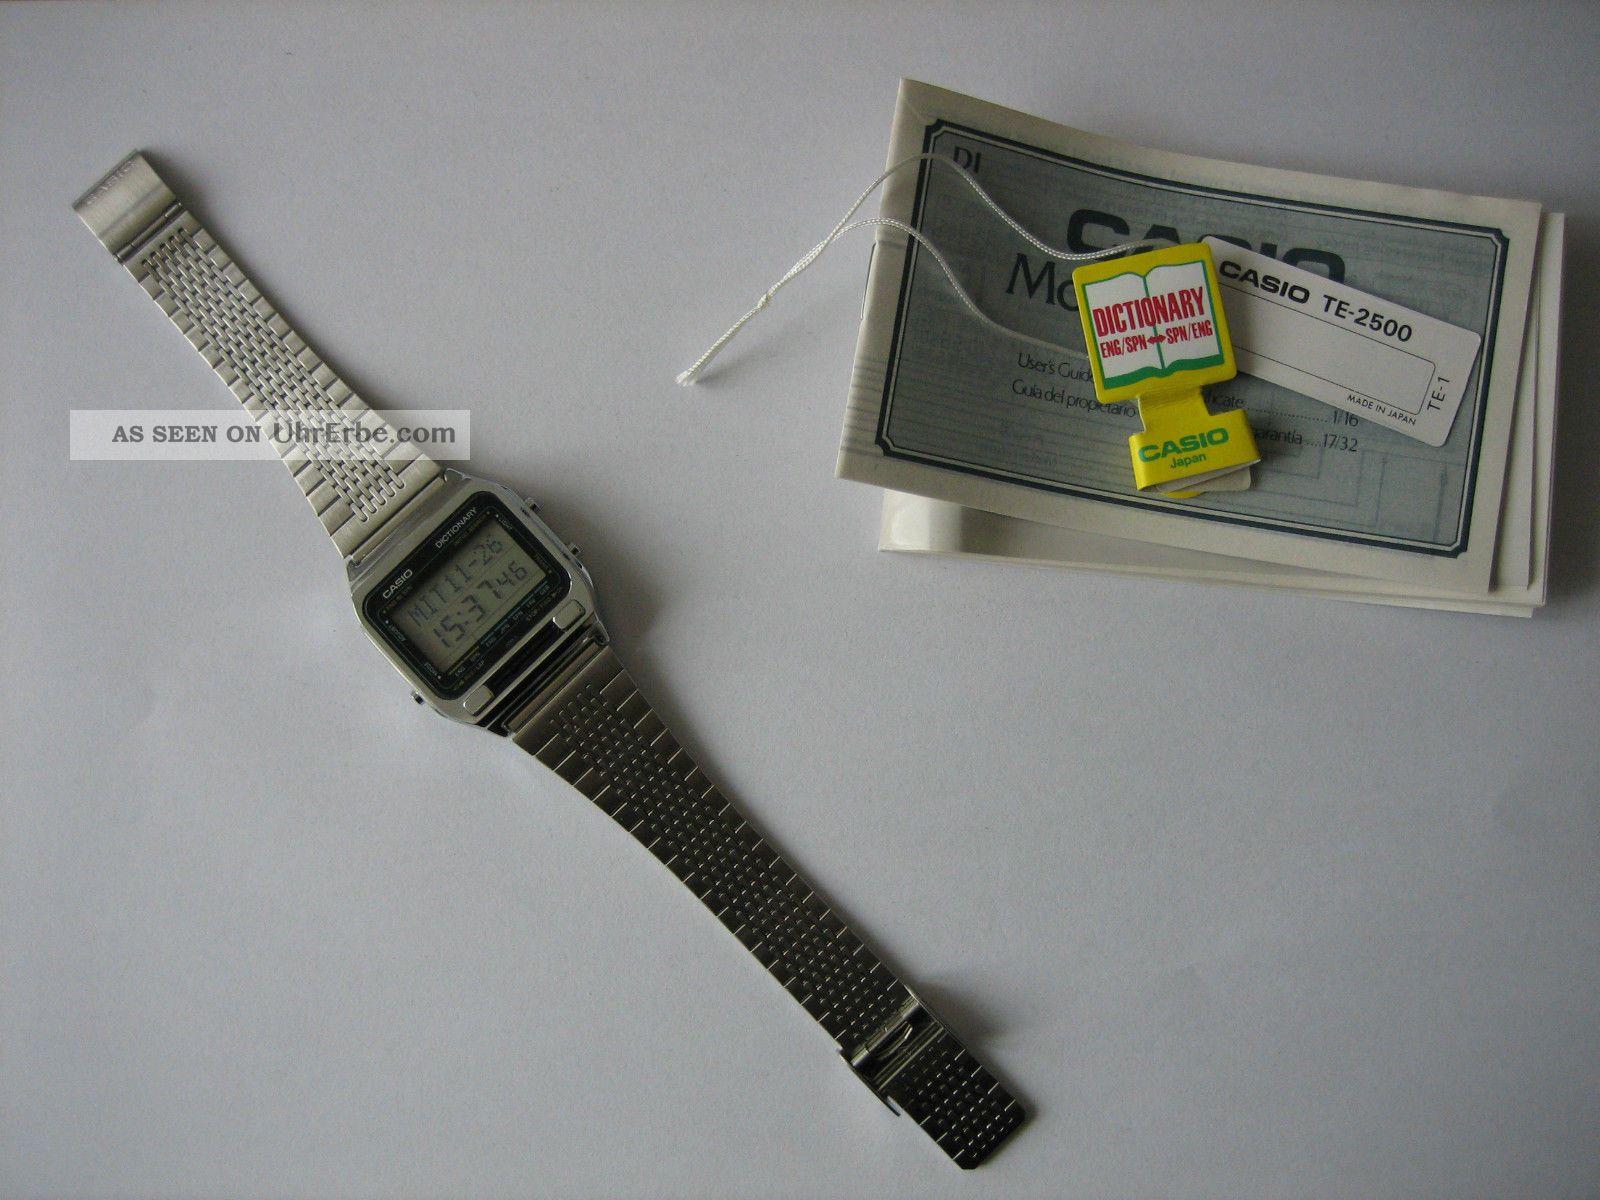 Casio Te - 2500 Dictionary,  Nos,  Vintage,  Retro,  Rar,  Selten,  Digital,  80er Armbanduhren Bild